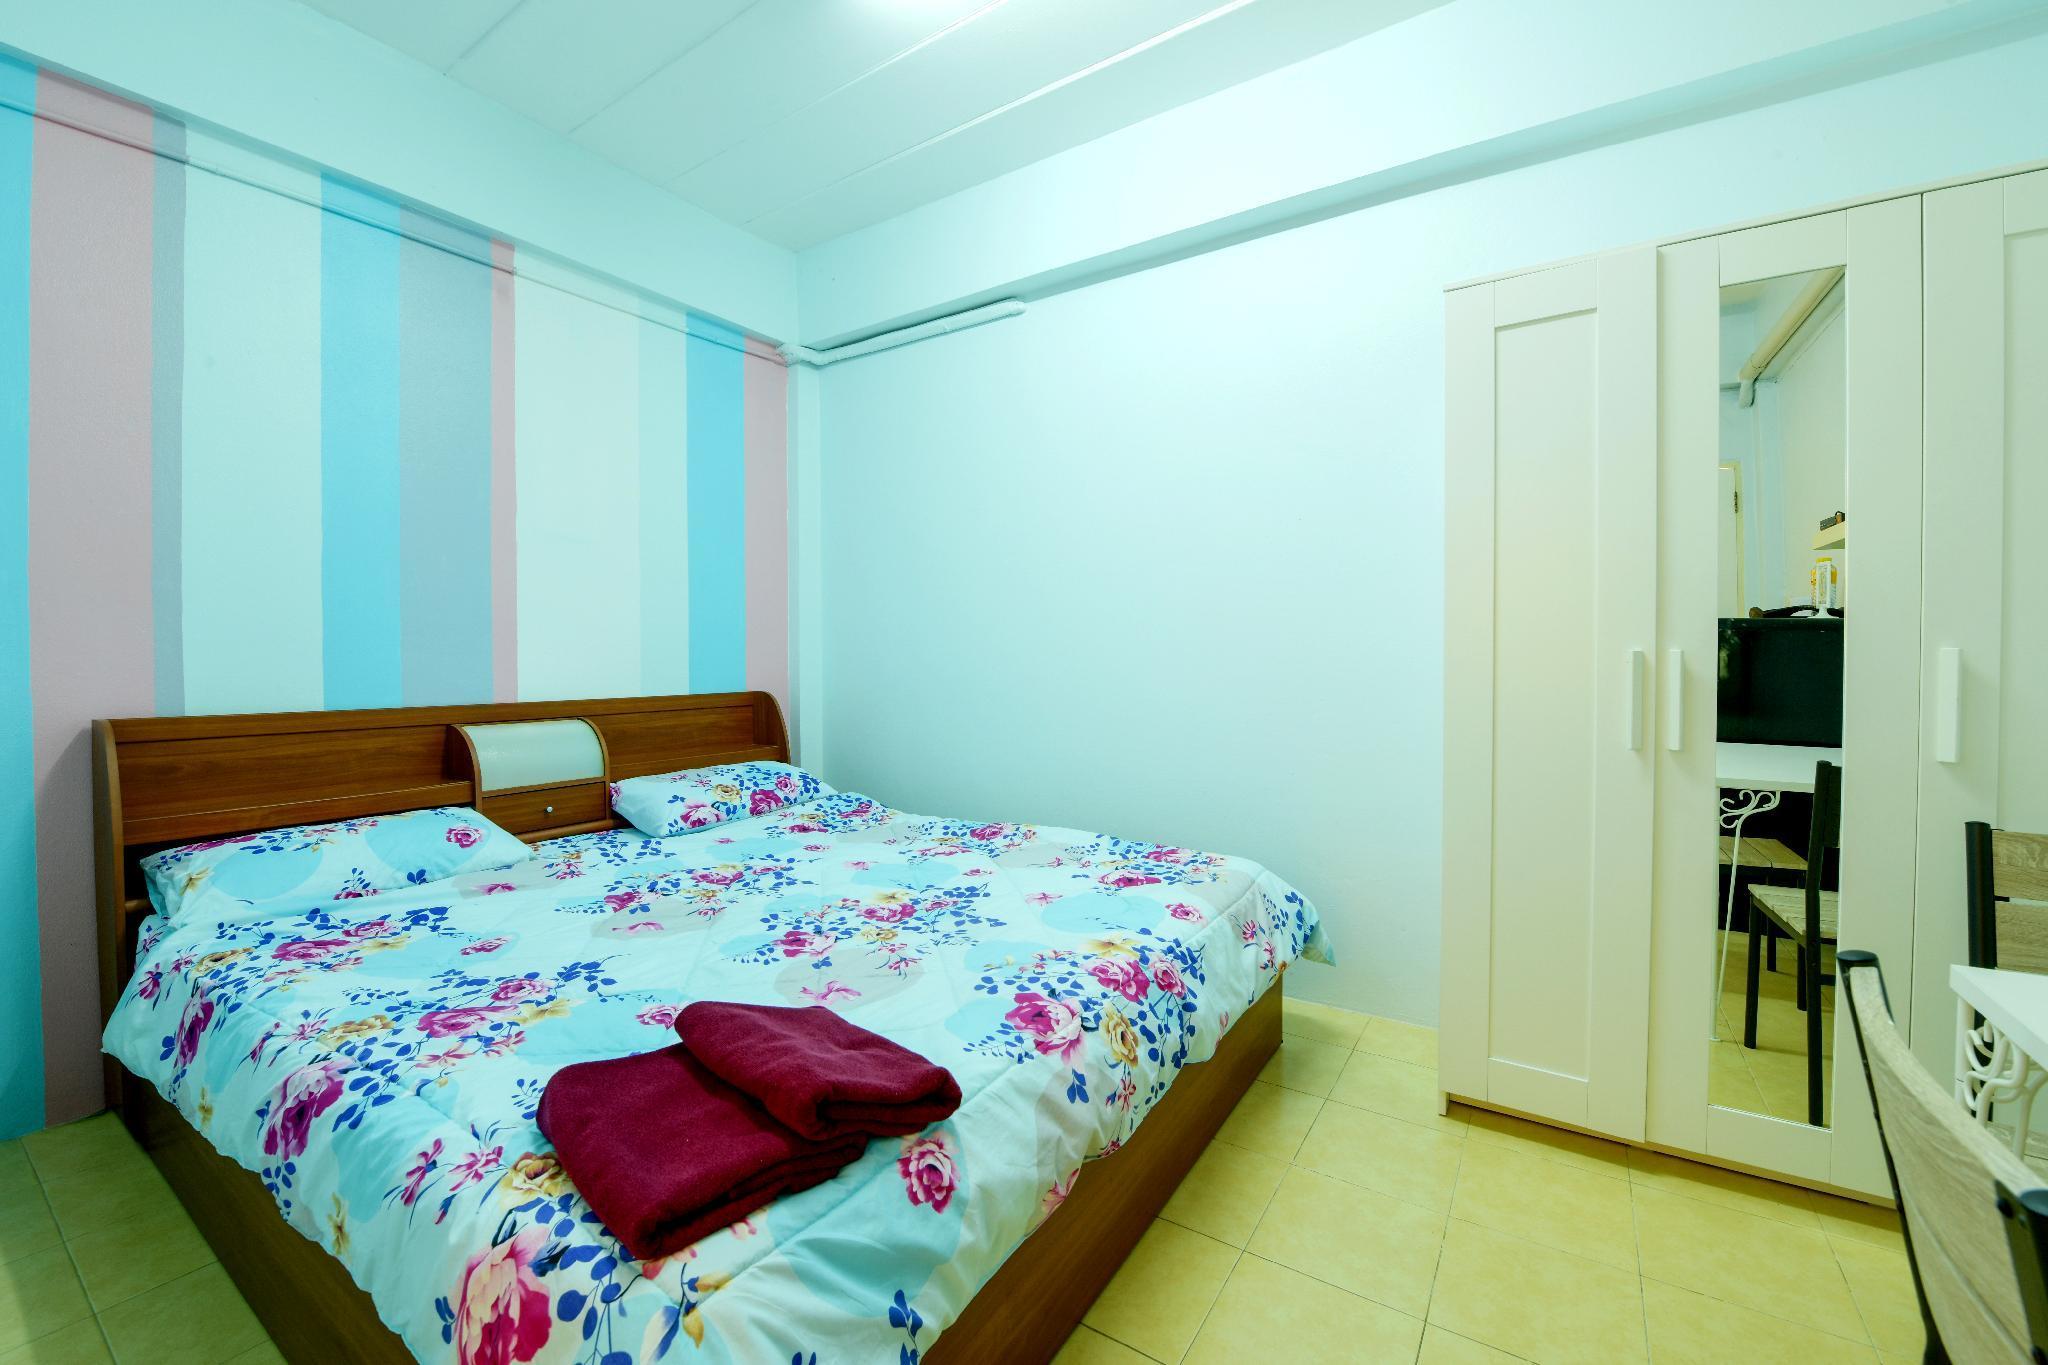 Sindy Room